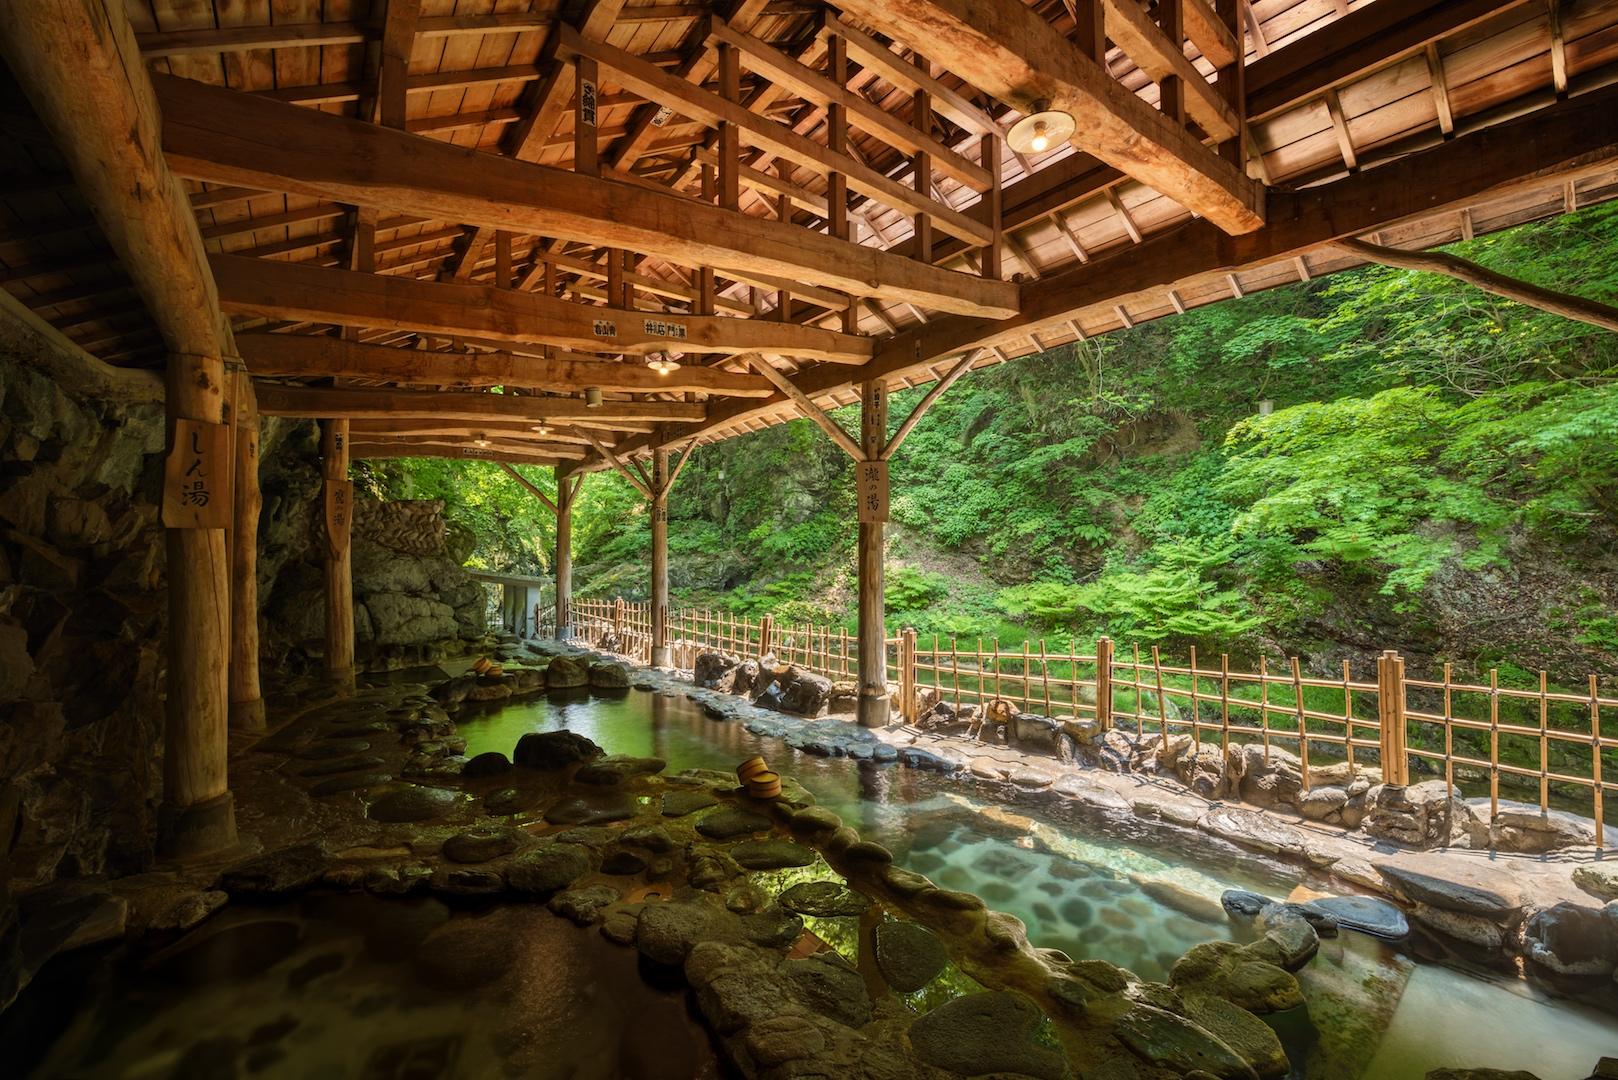 Sakunami Onsen outdoor bath